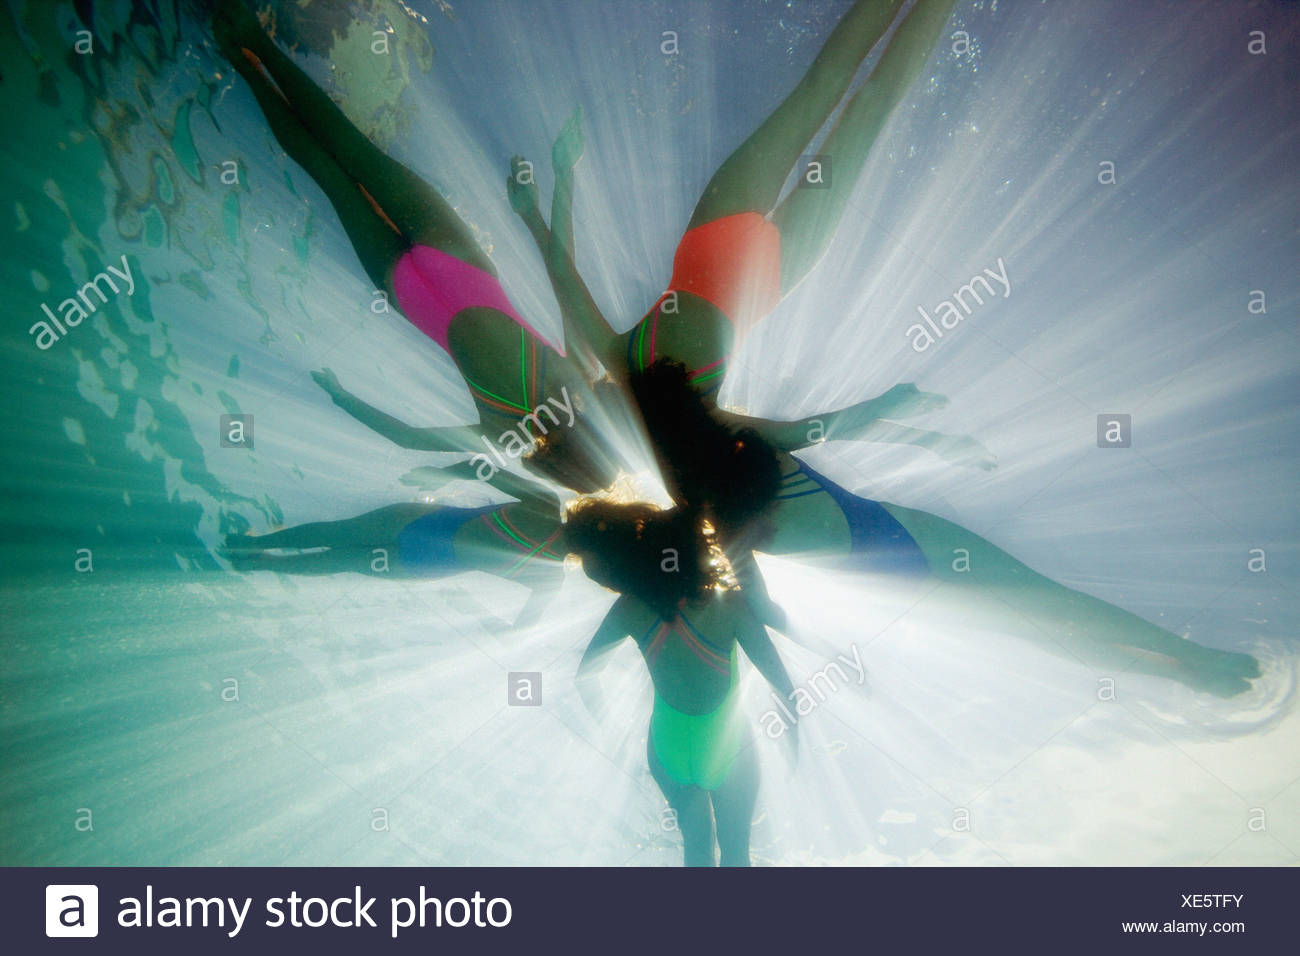 Underwater de natation synchronisée Photo Stock